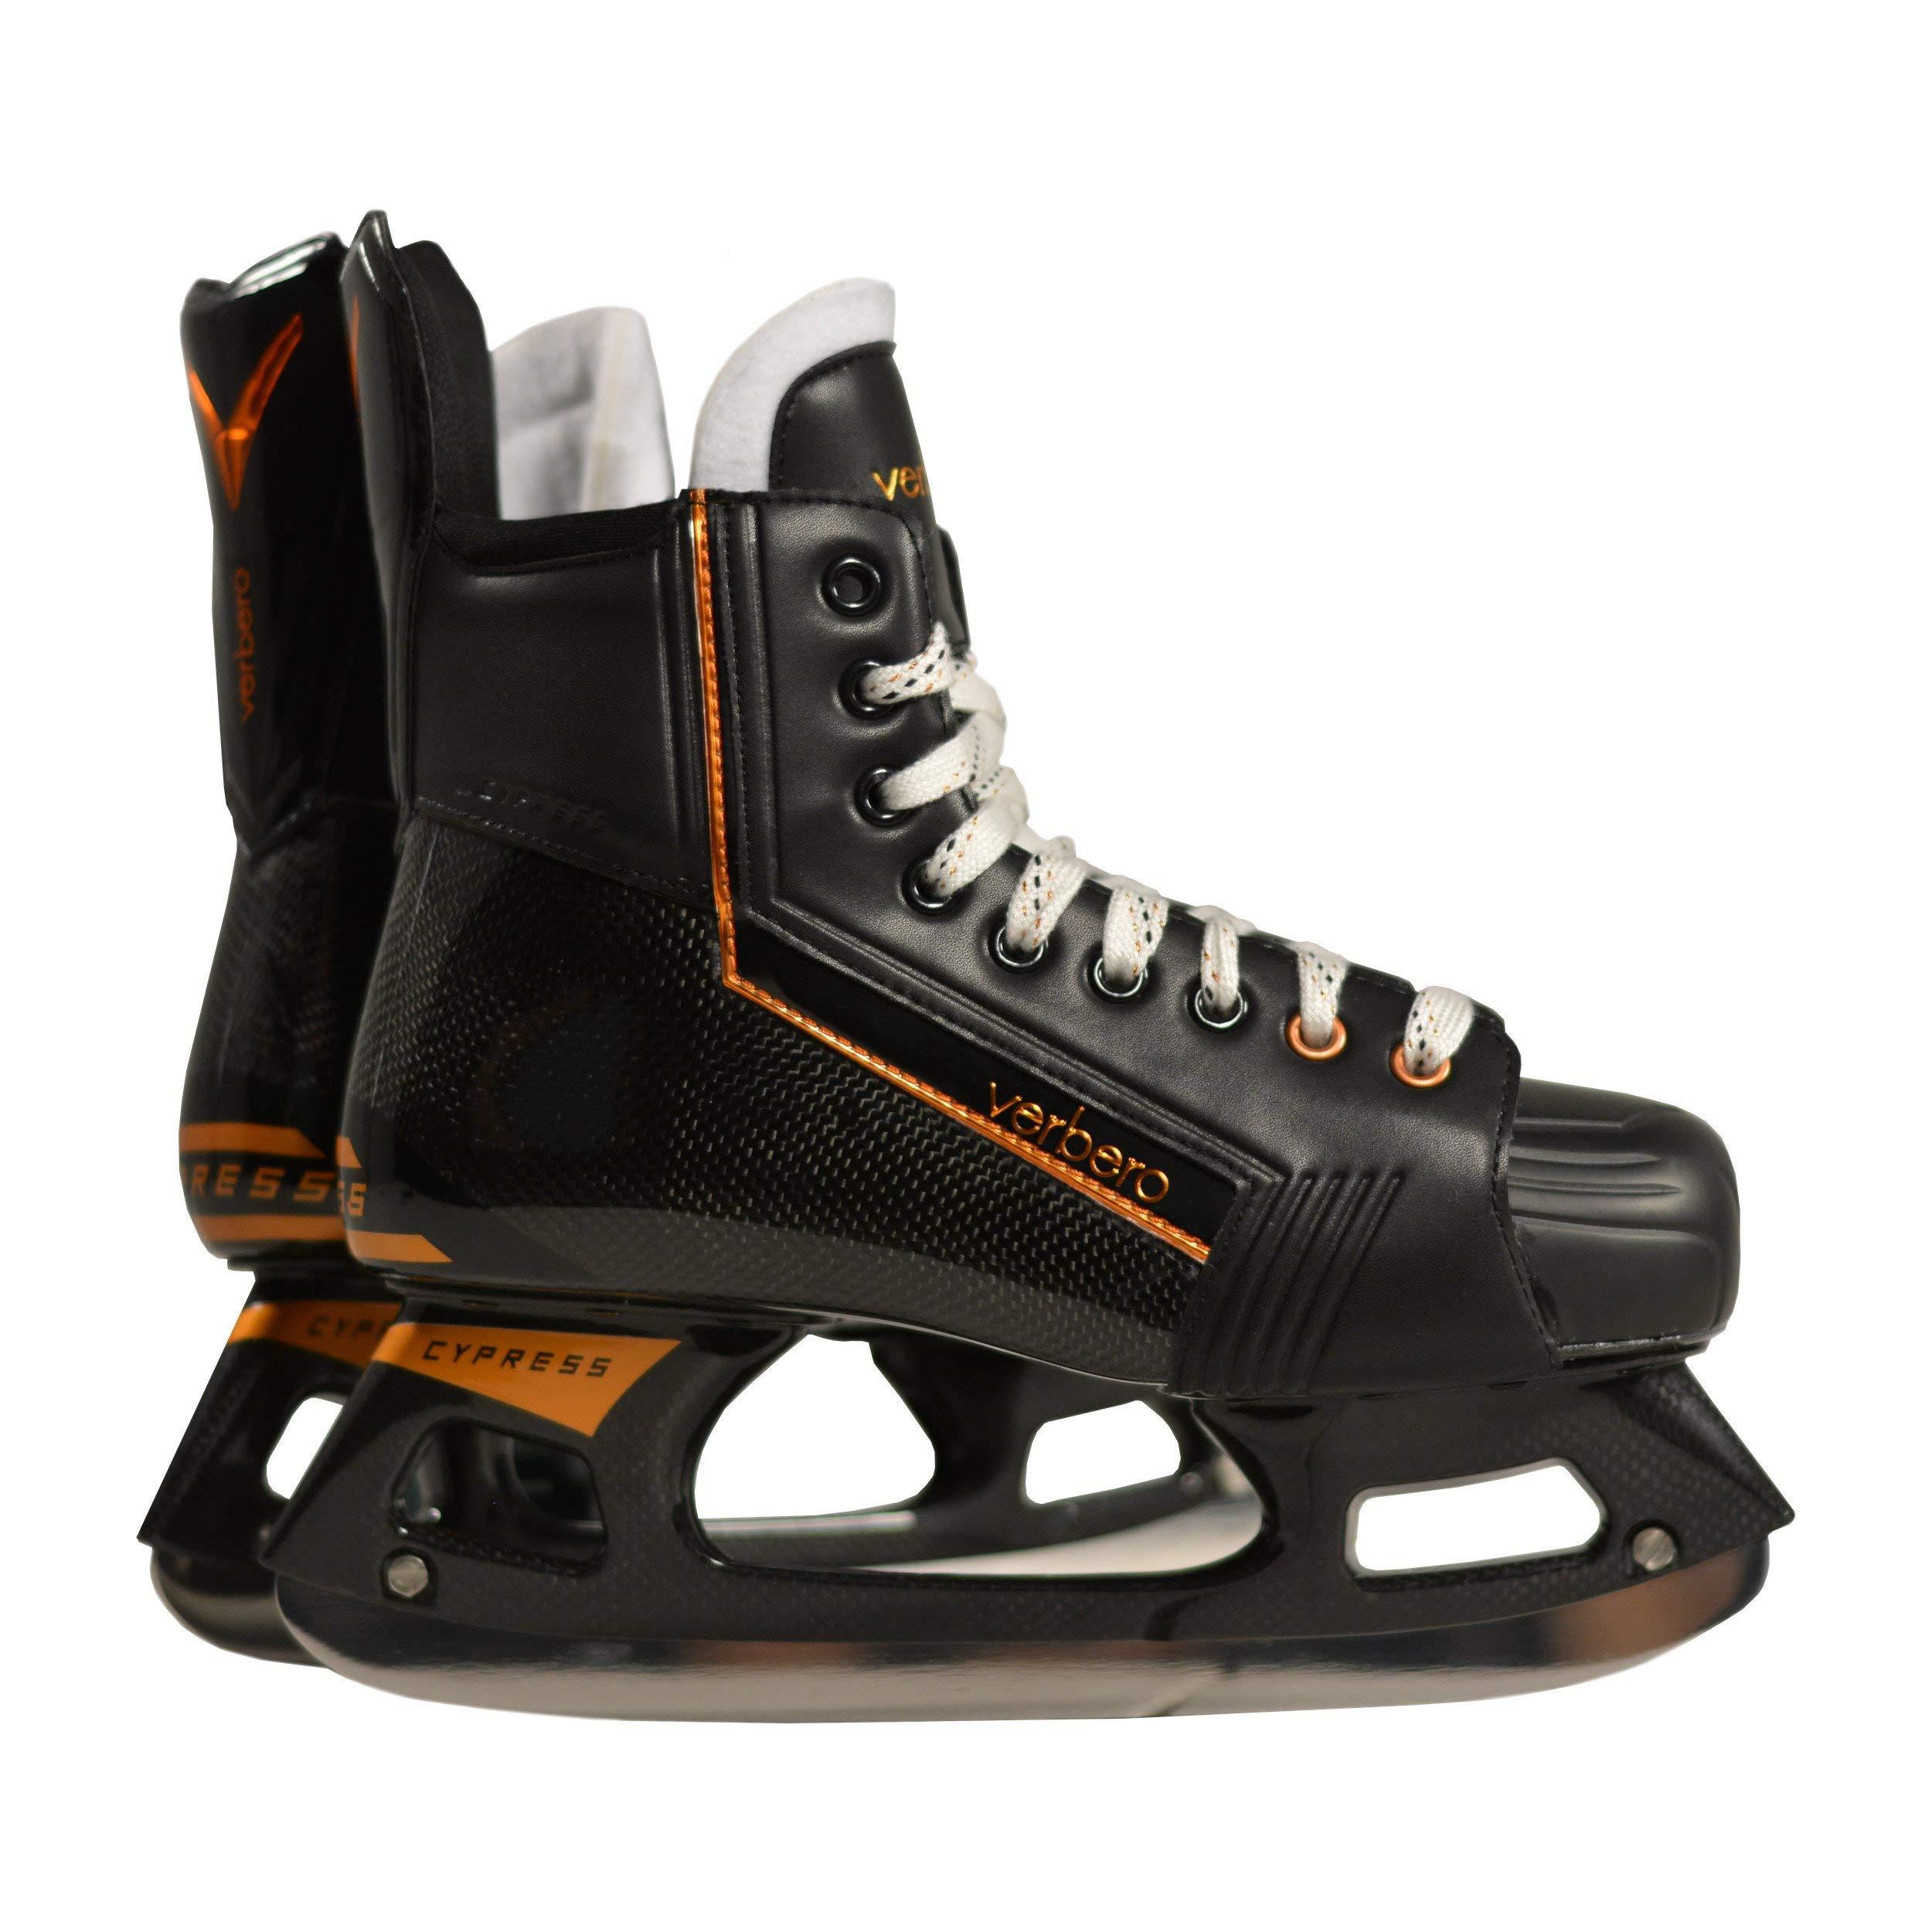 VERBERO Cypress Pro+ Ice Hockey Skate (Black 6.0) by VERBERO (Image #1)